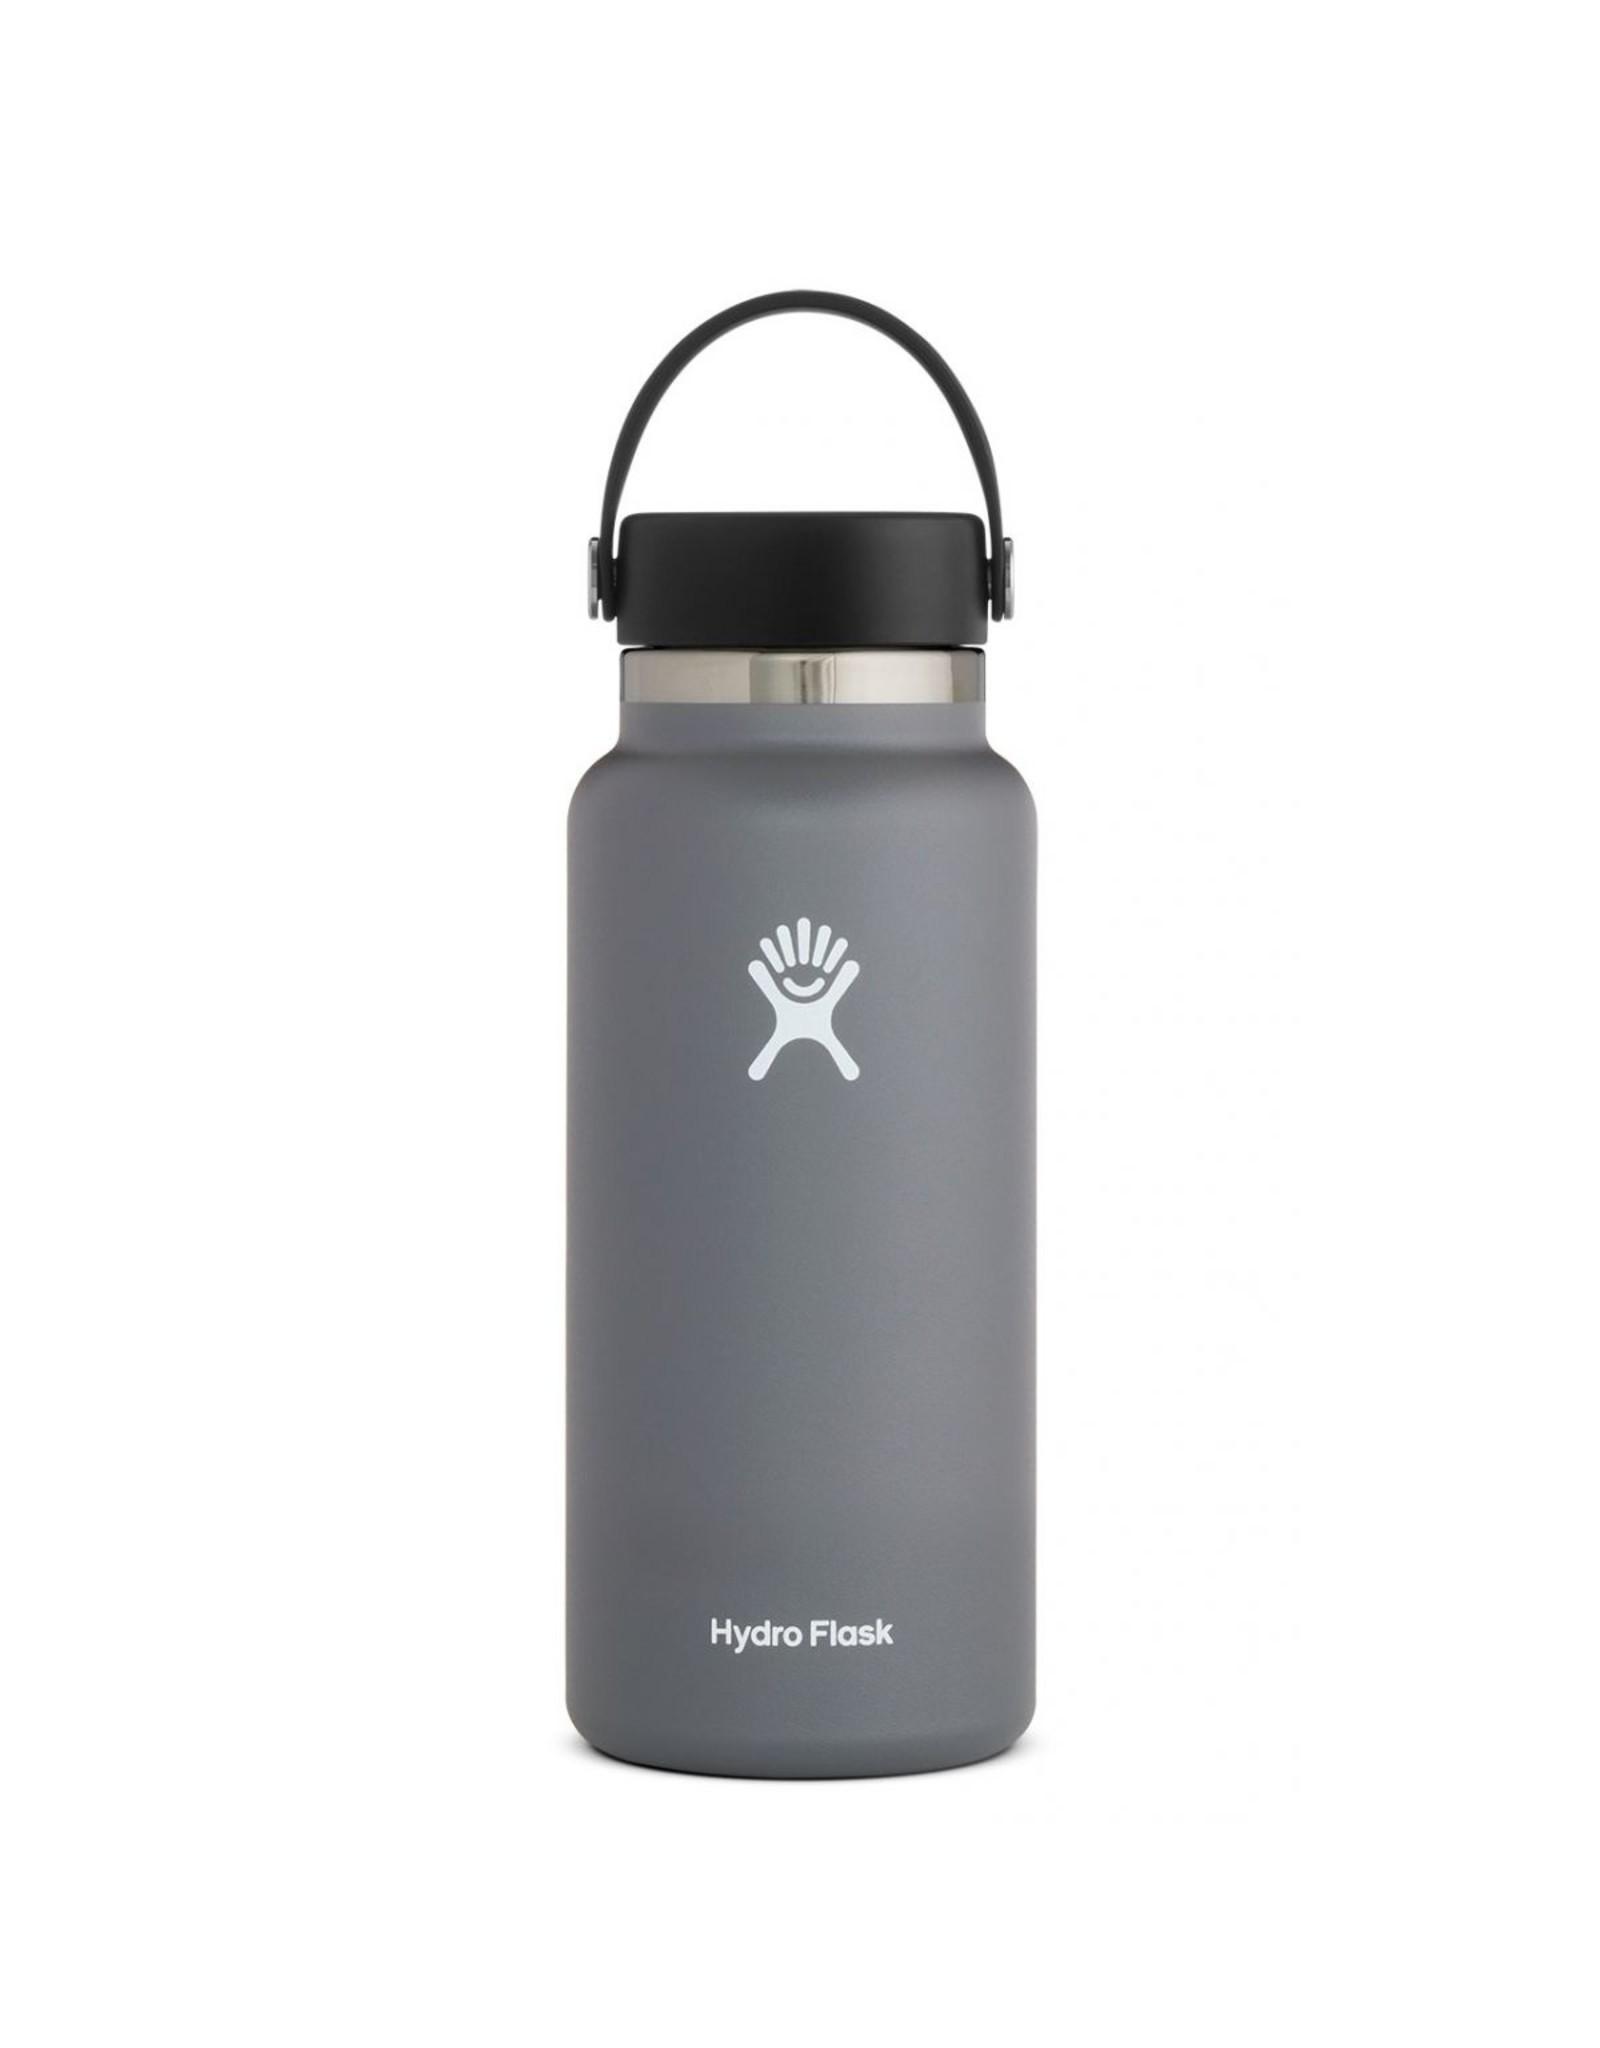 Hydro Flask Hydro Flask 32oz Wide Mouth w/ Flex Cap Stone